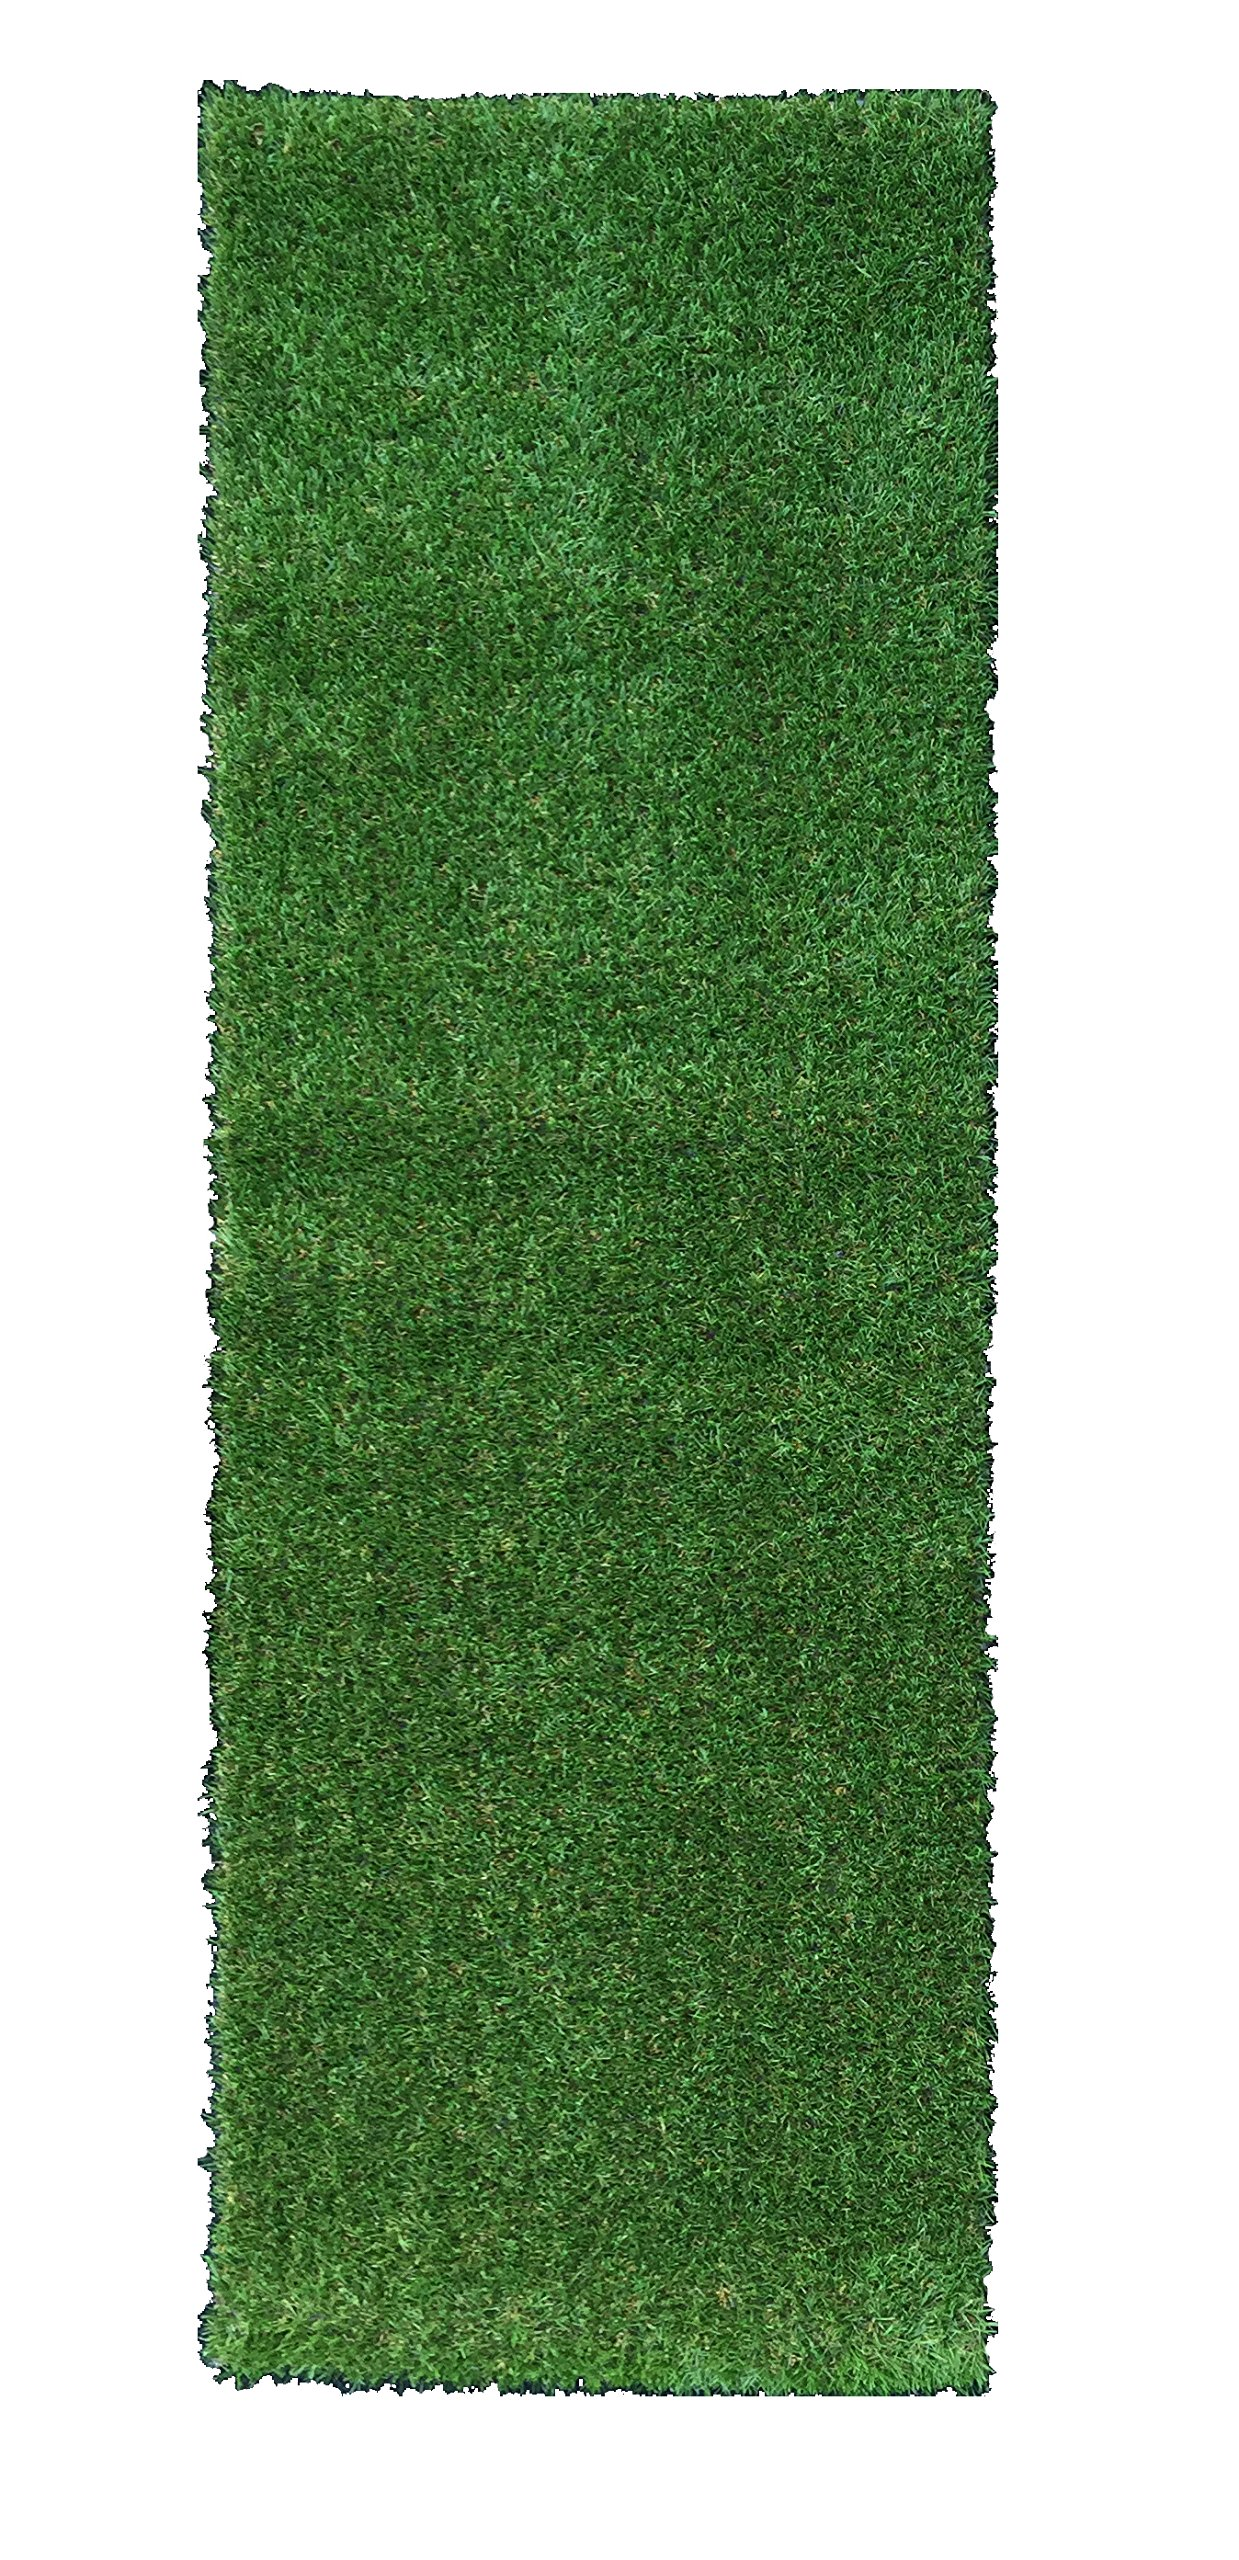 Ottomanson Evergreen Collection Indoor/Outdoor Green Artificial Grass Turf Solid Design Runner Rug, 2'7'' x 8'